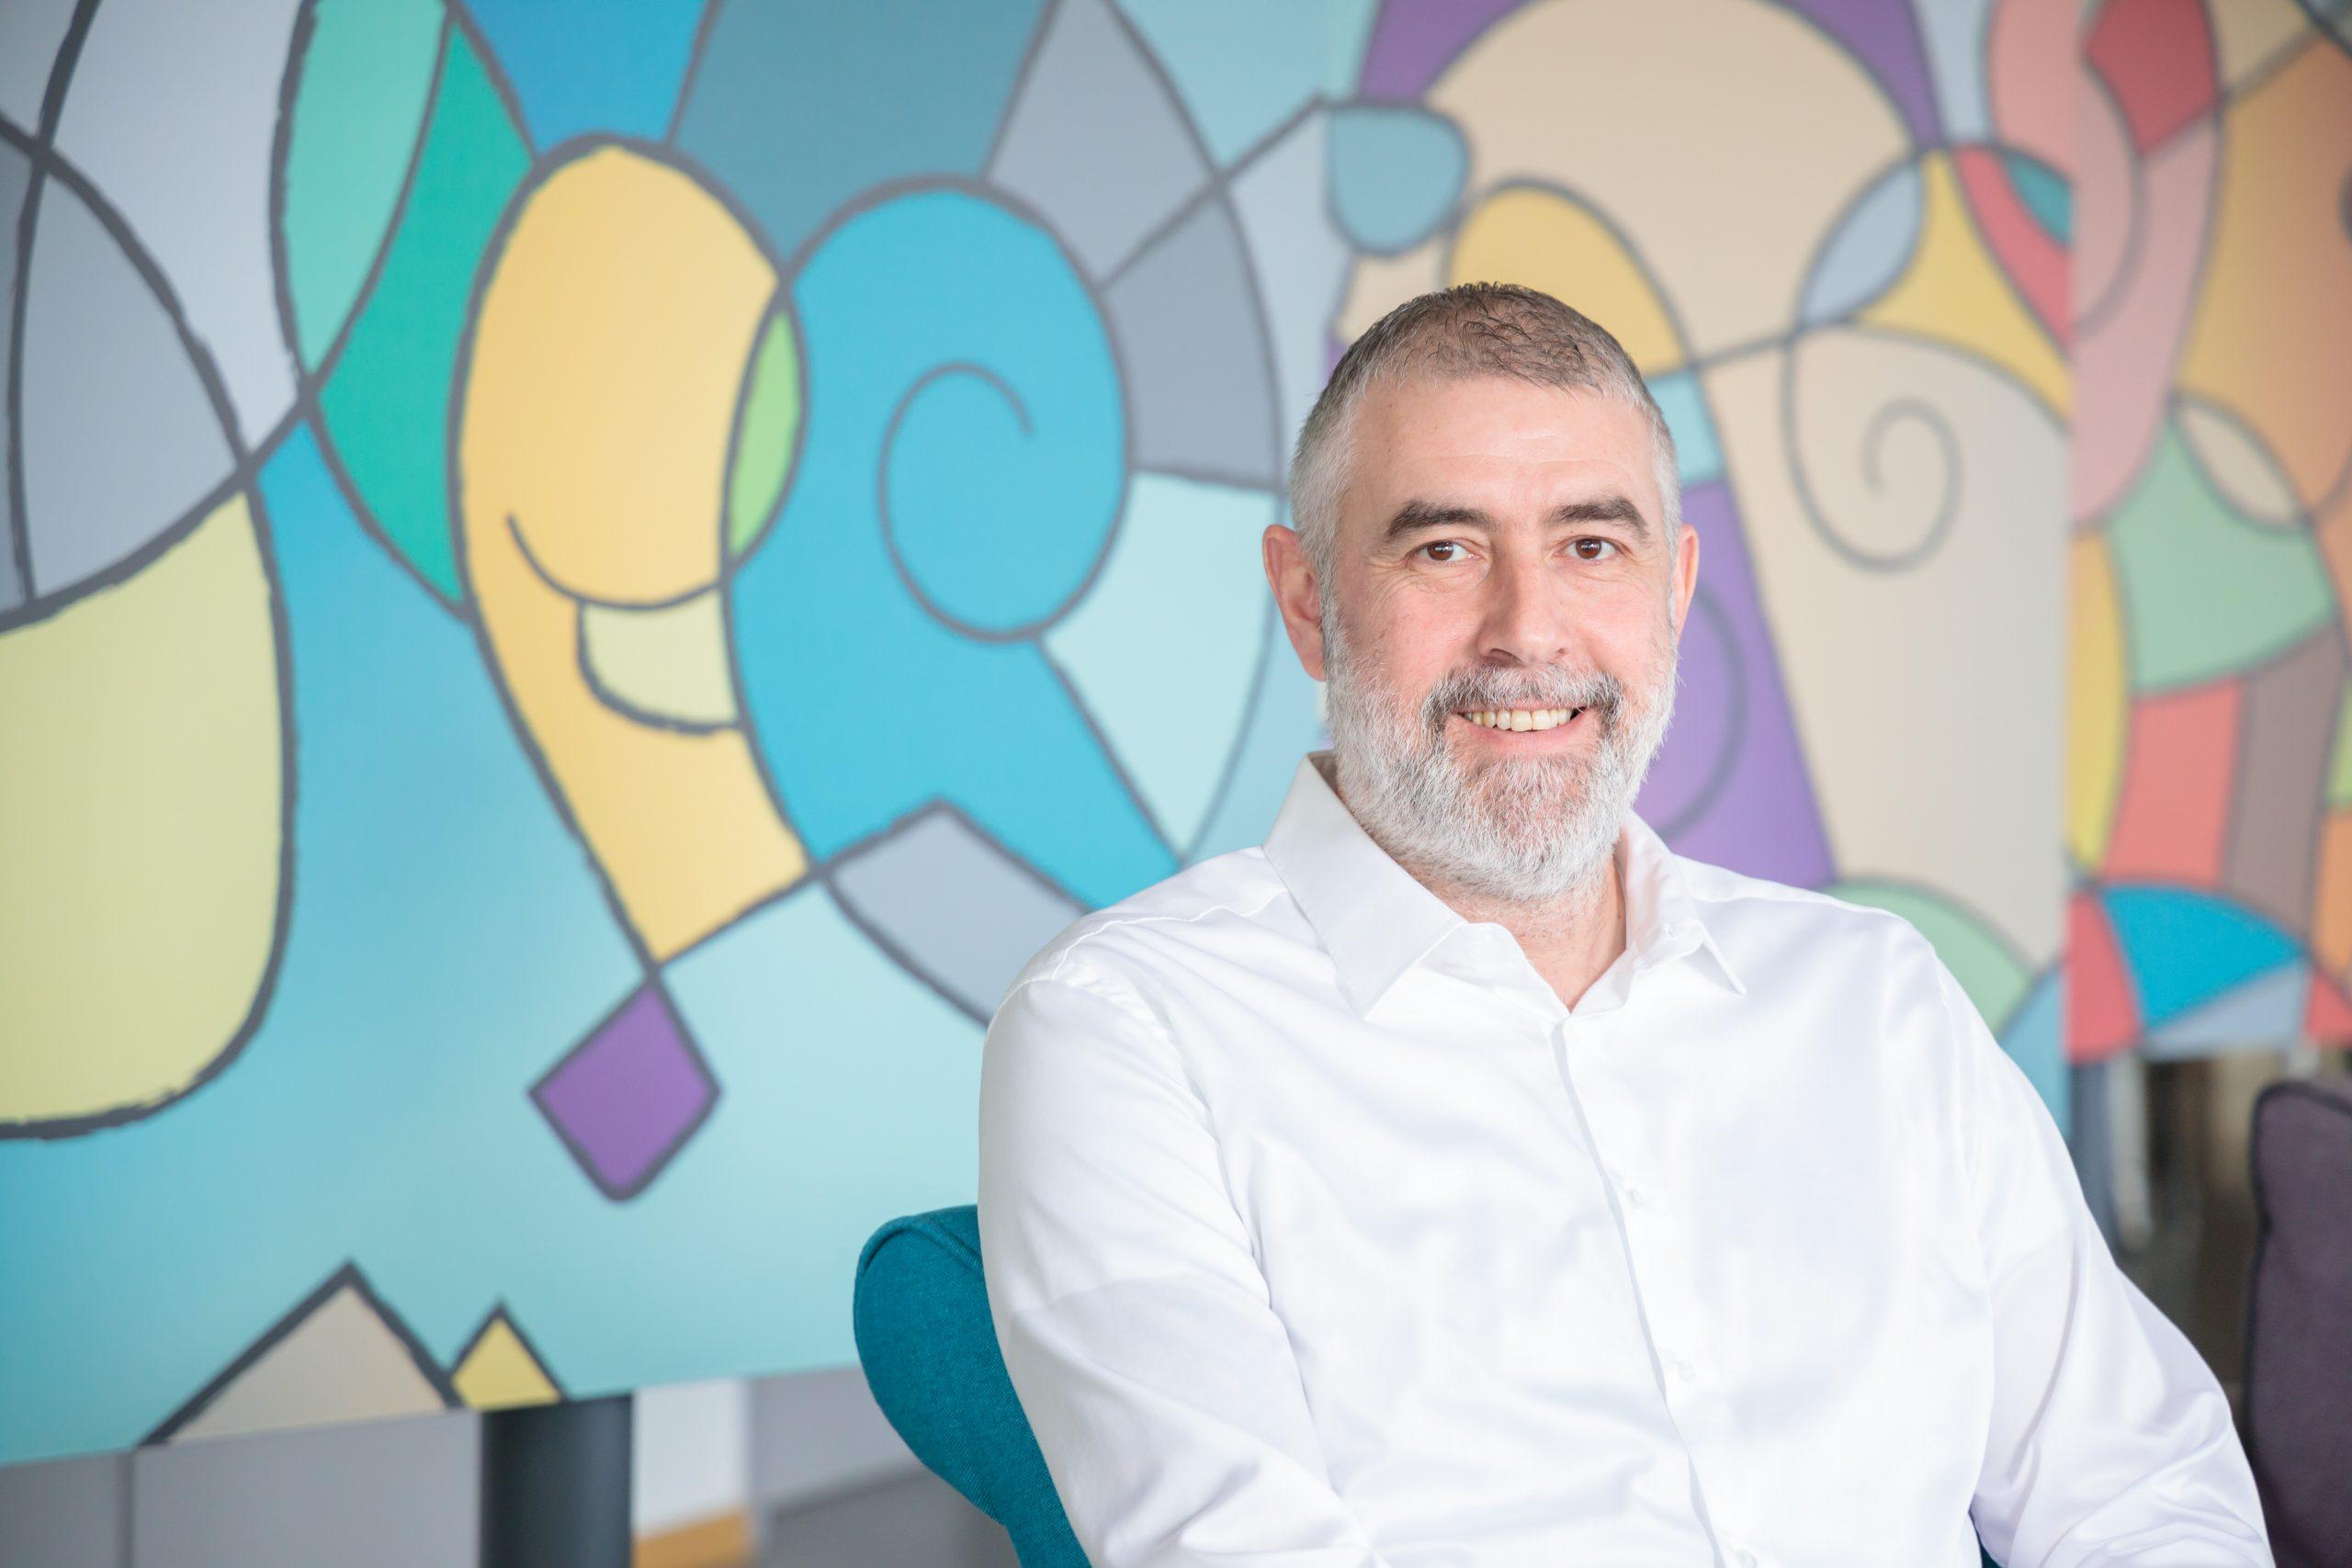 Denis Jašarević, IN2 Group CEO 1 - hrpsor Hrvatski poslovni savjet za održivi razvoj